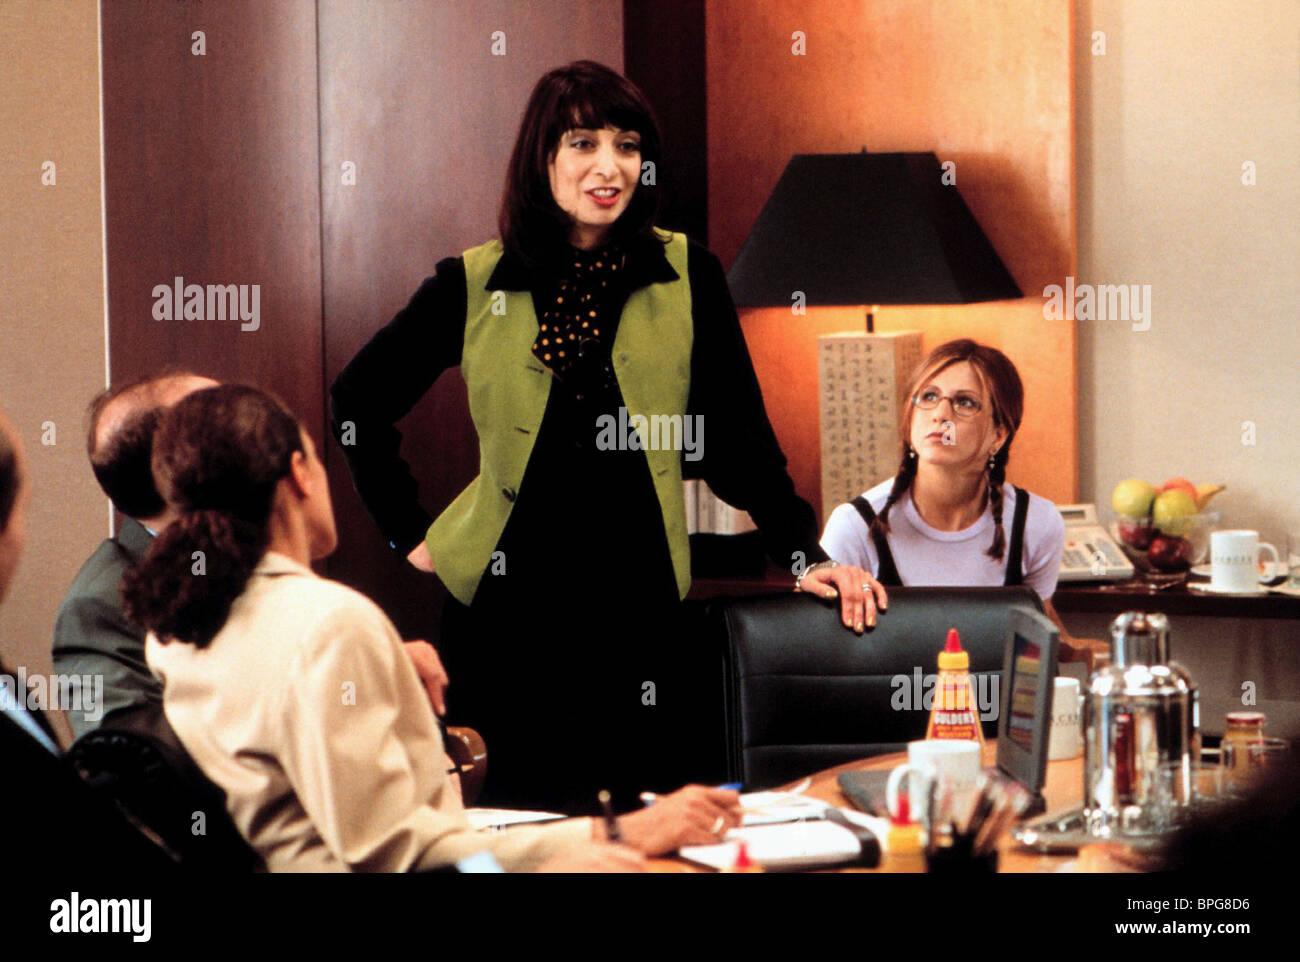 Picture Perfect: ILLEANA DOUGLAS & JENNIFER ANISTON PICTURE PERFECT (1997